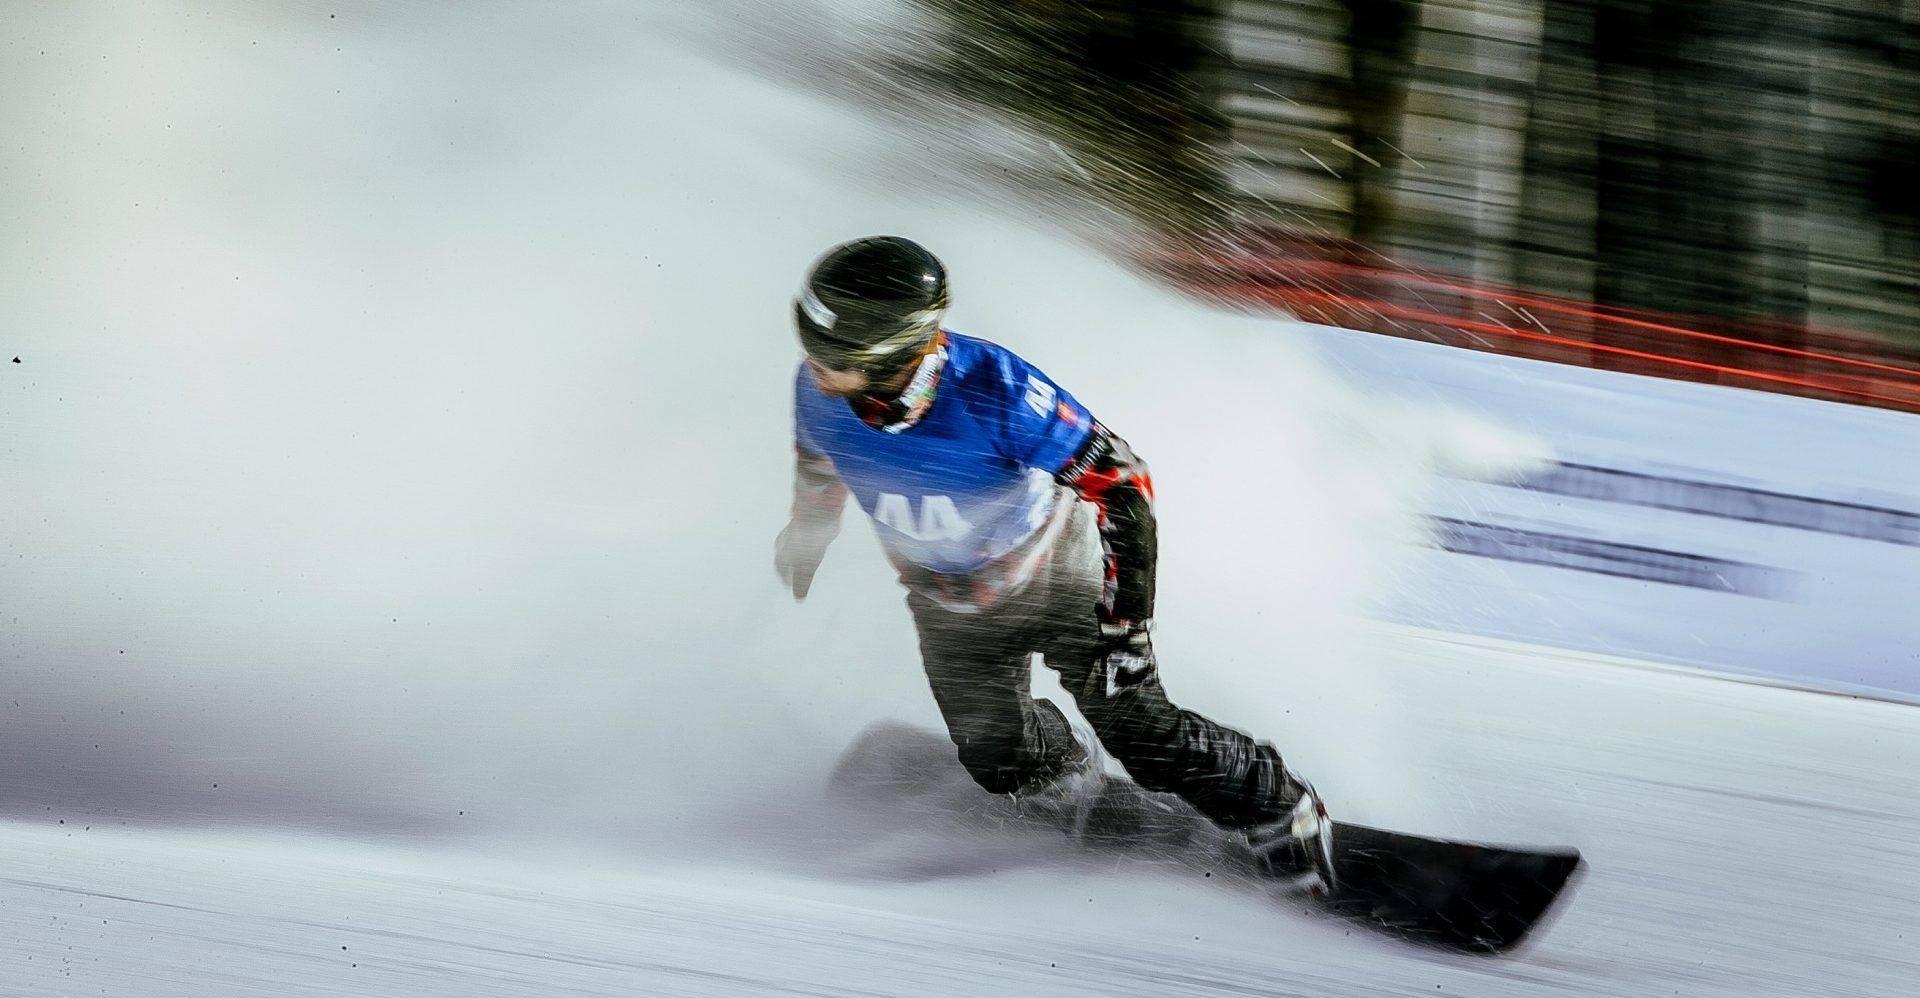 Flywheel Training Snowboarding